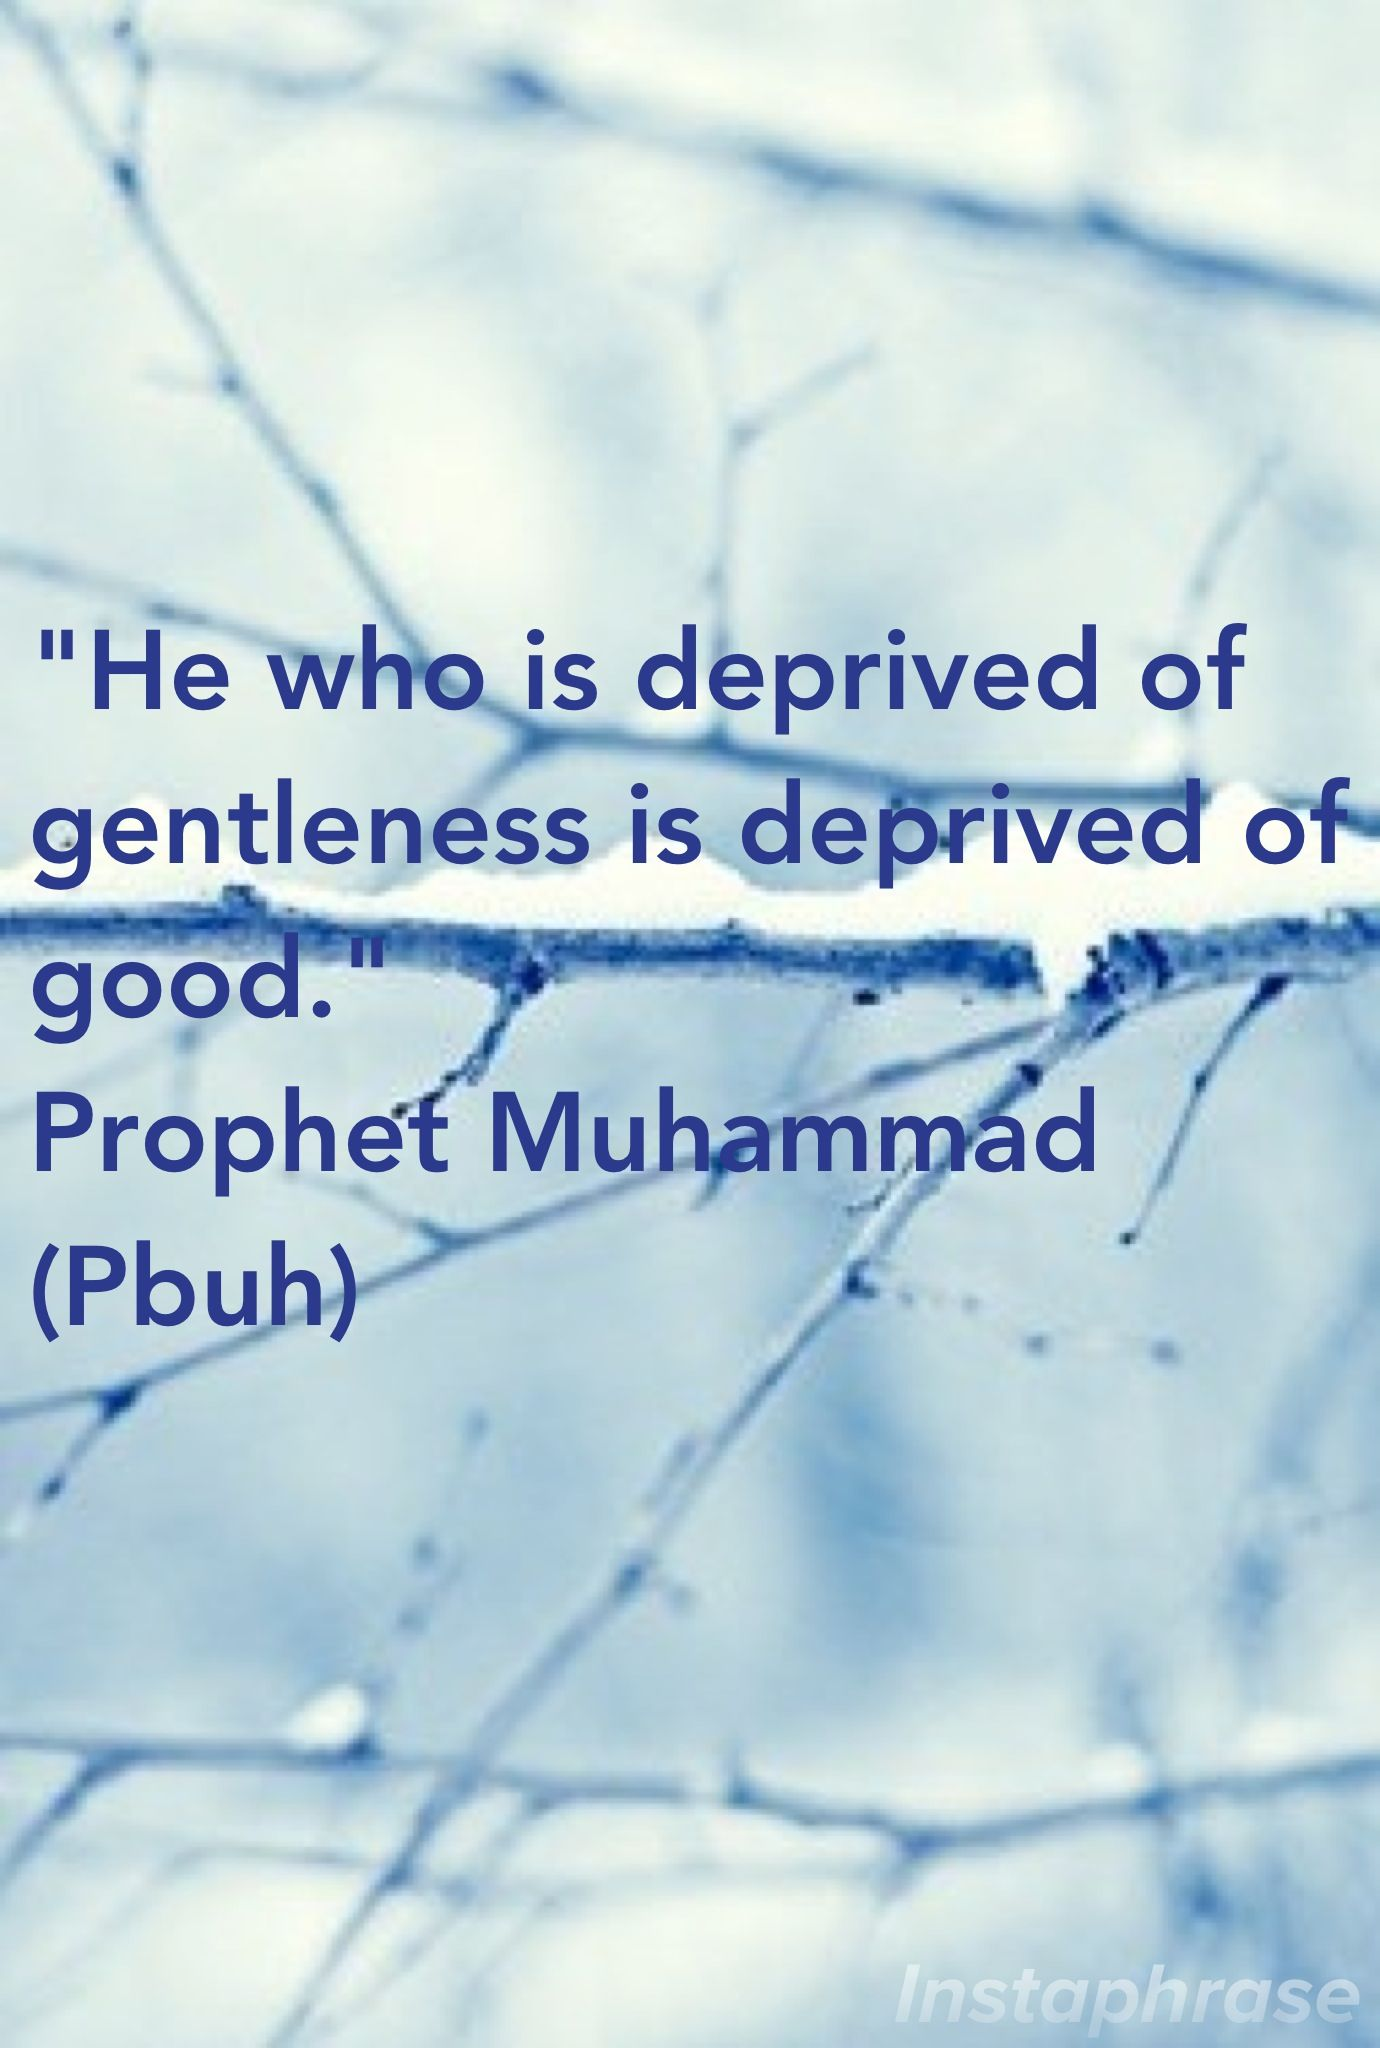 He who is deprived of gentleness is deprived of good.  Prophet Muhammad (Pbuh)